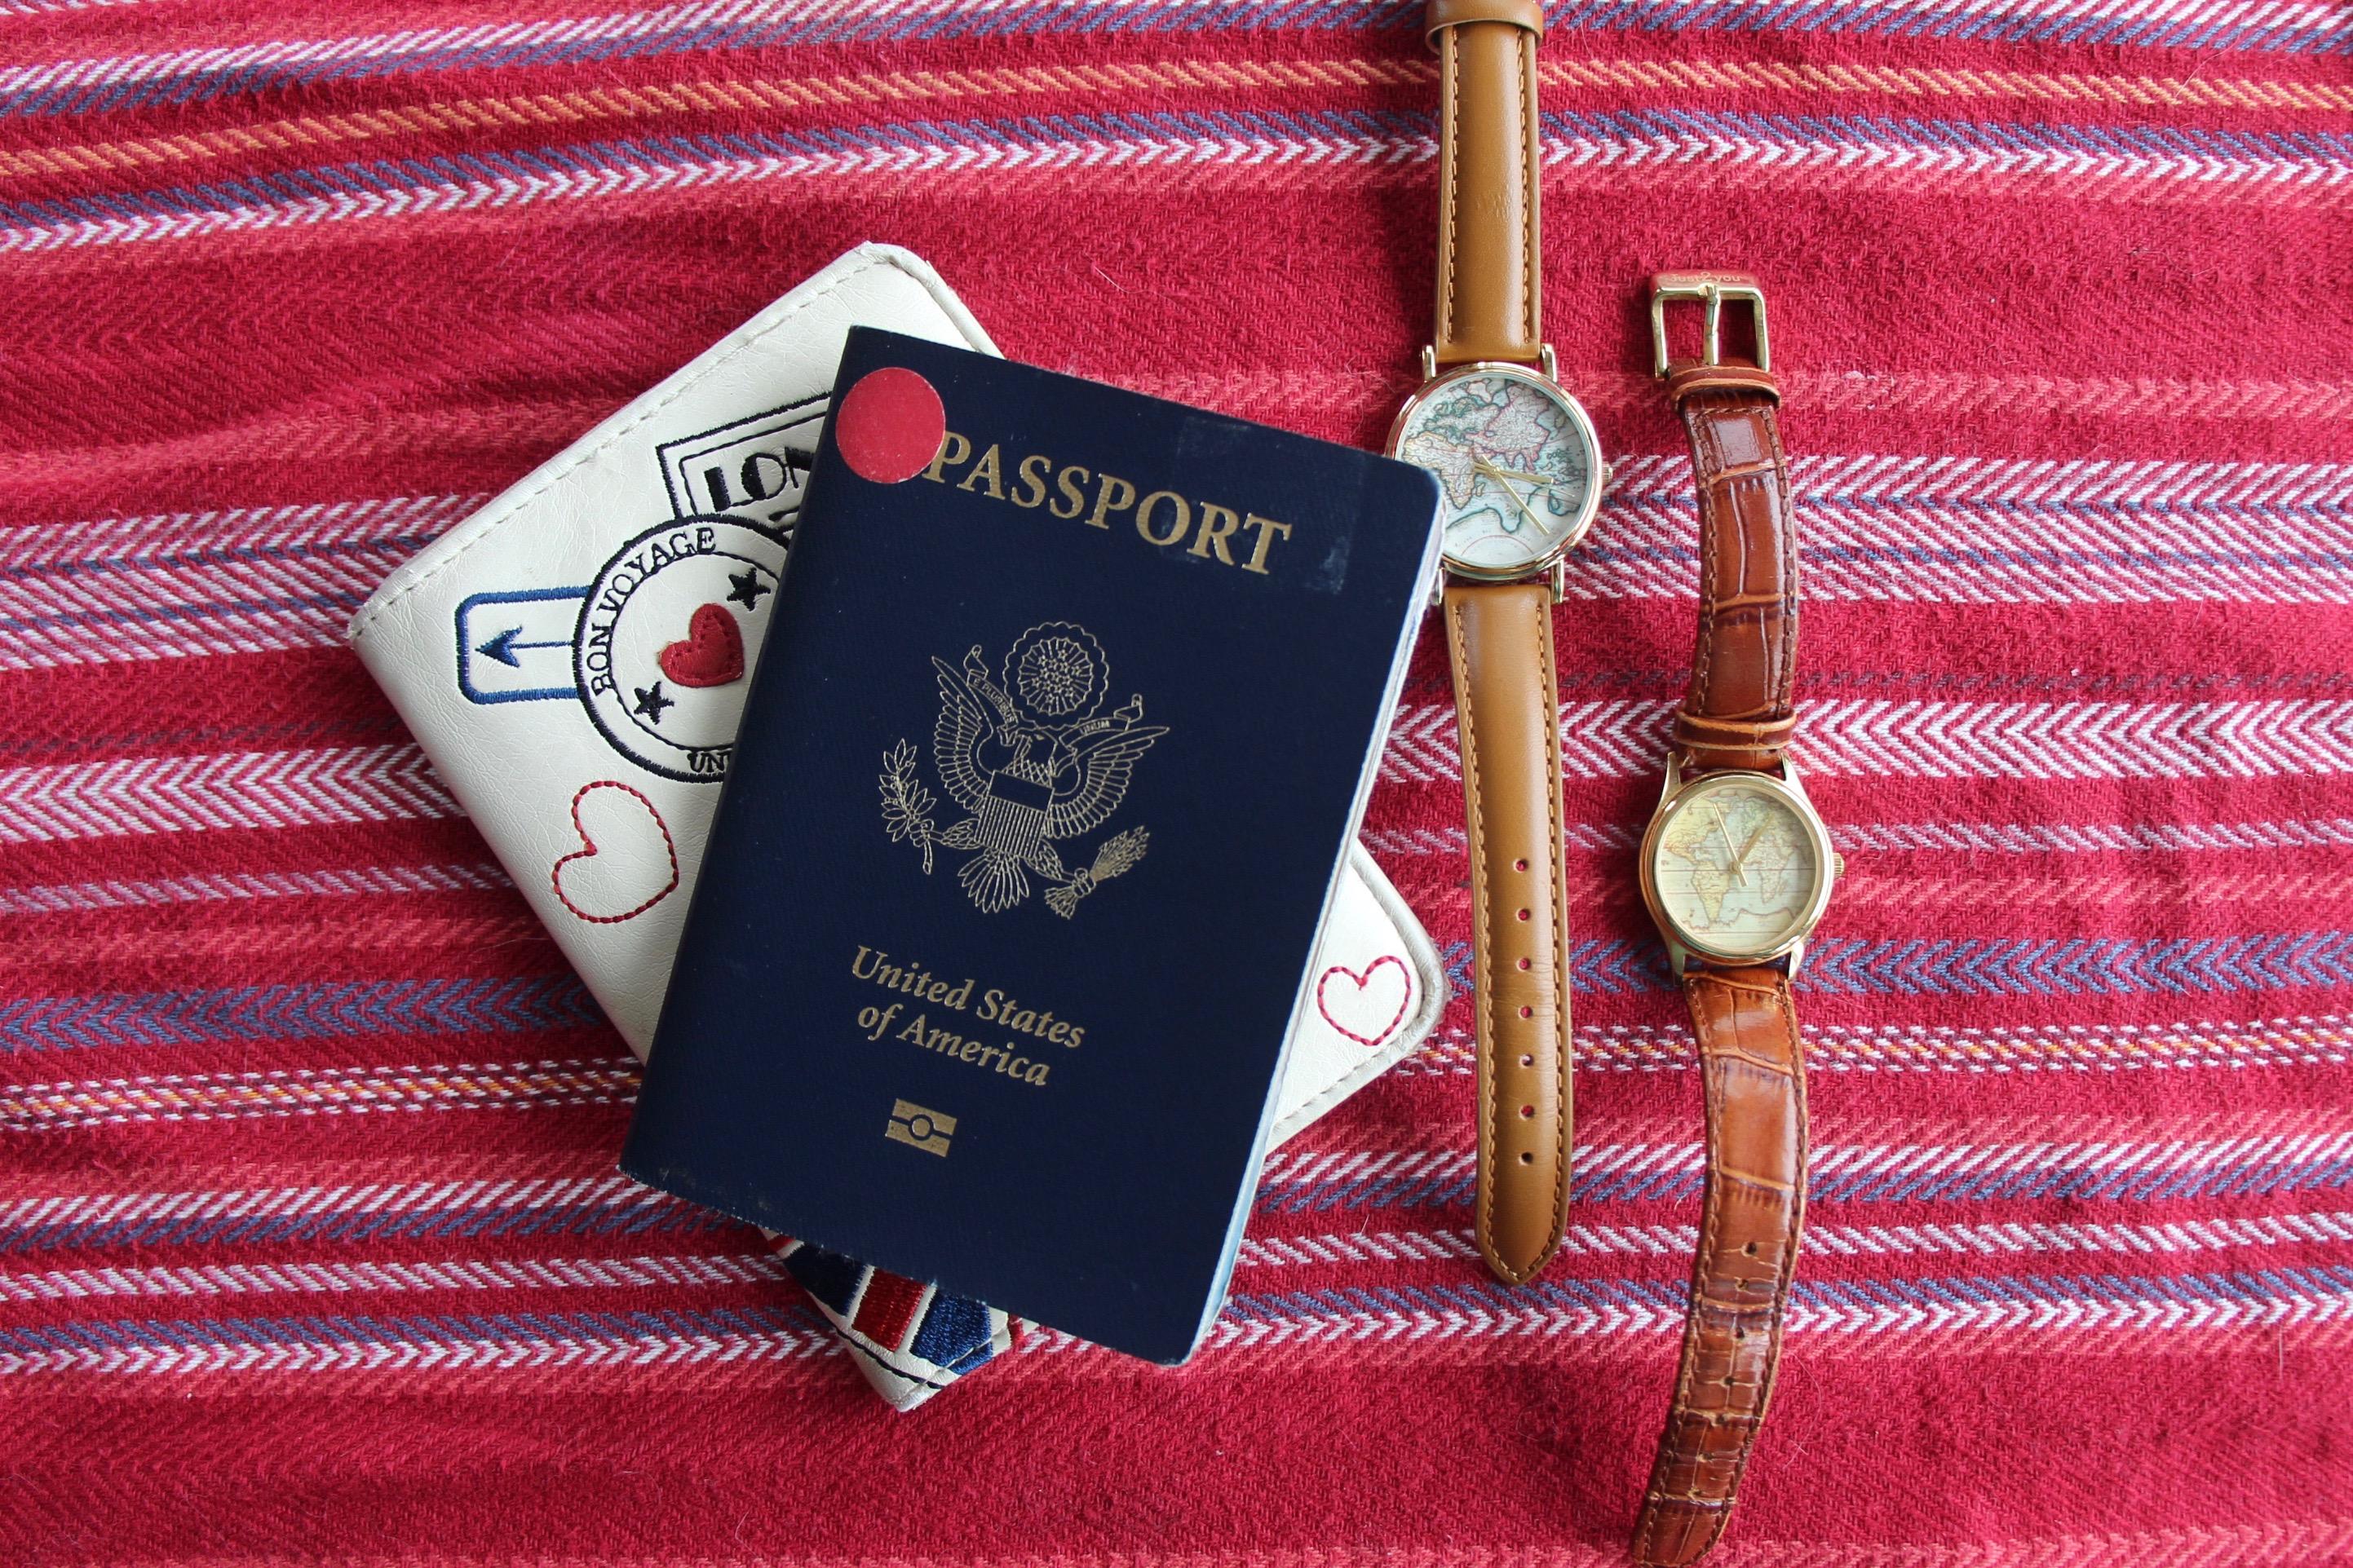 passport-and-map-watches-traverse-blog